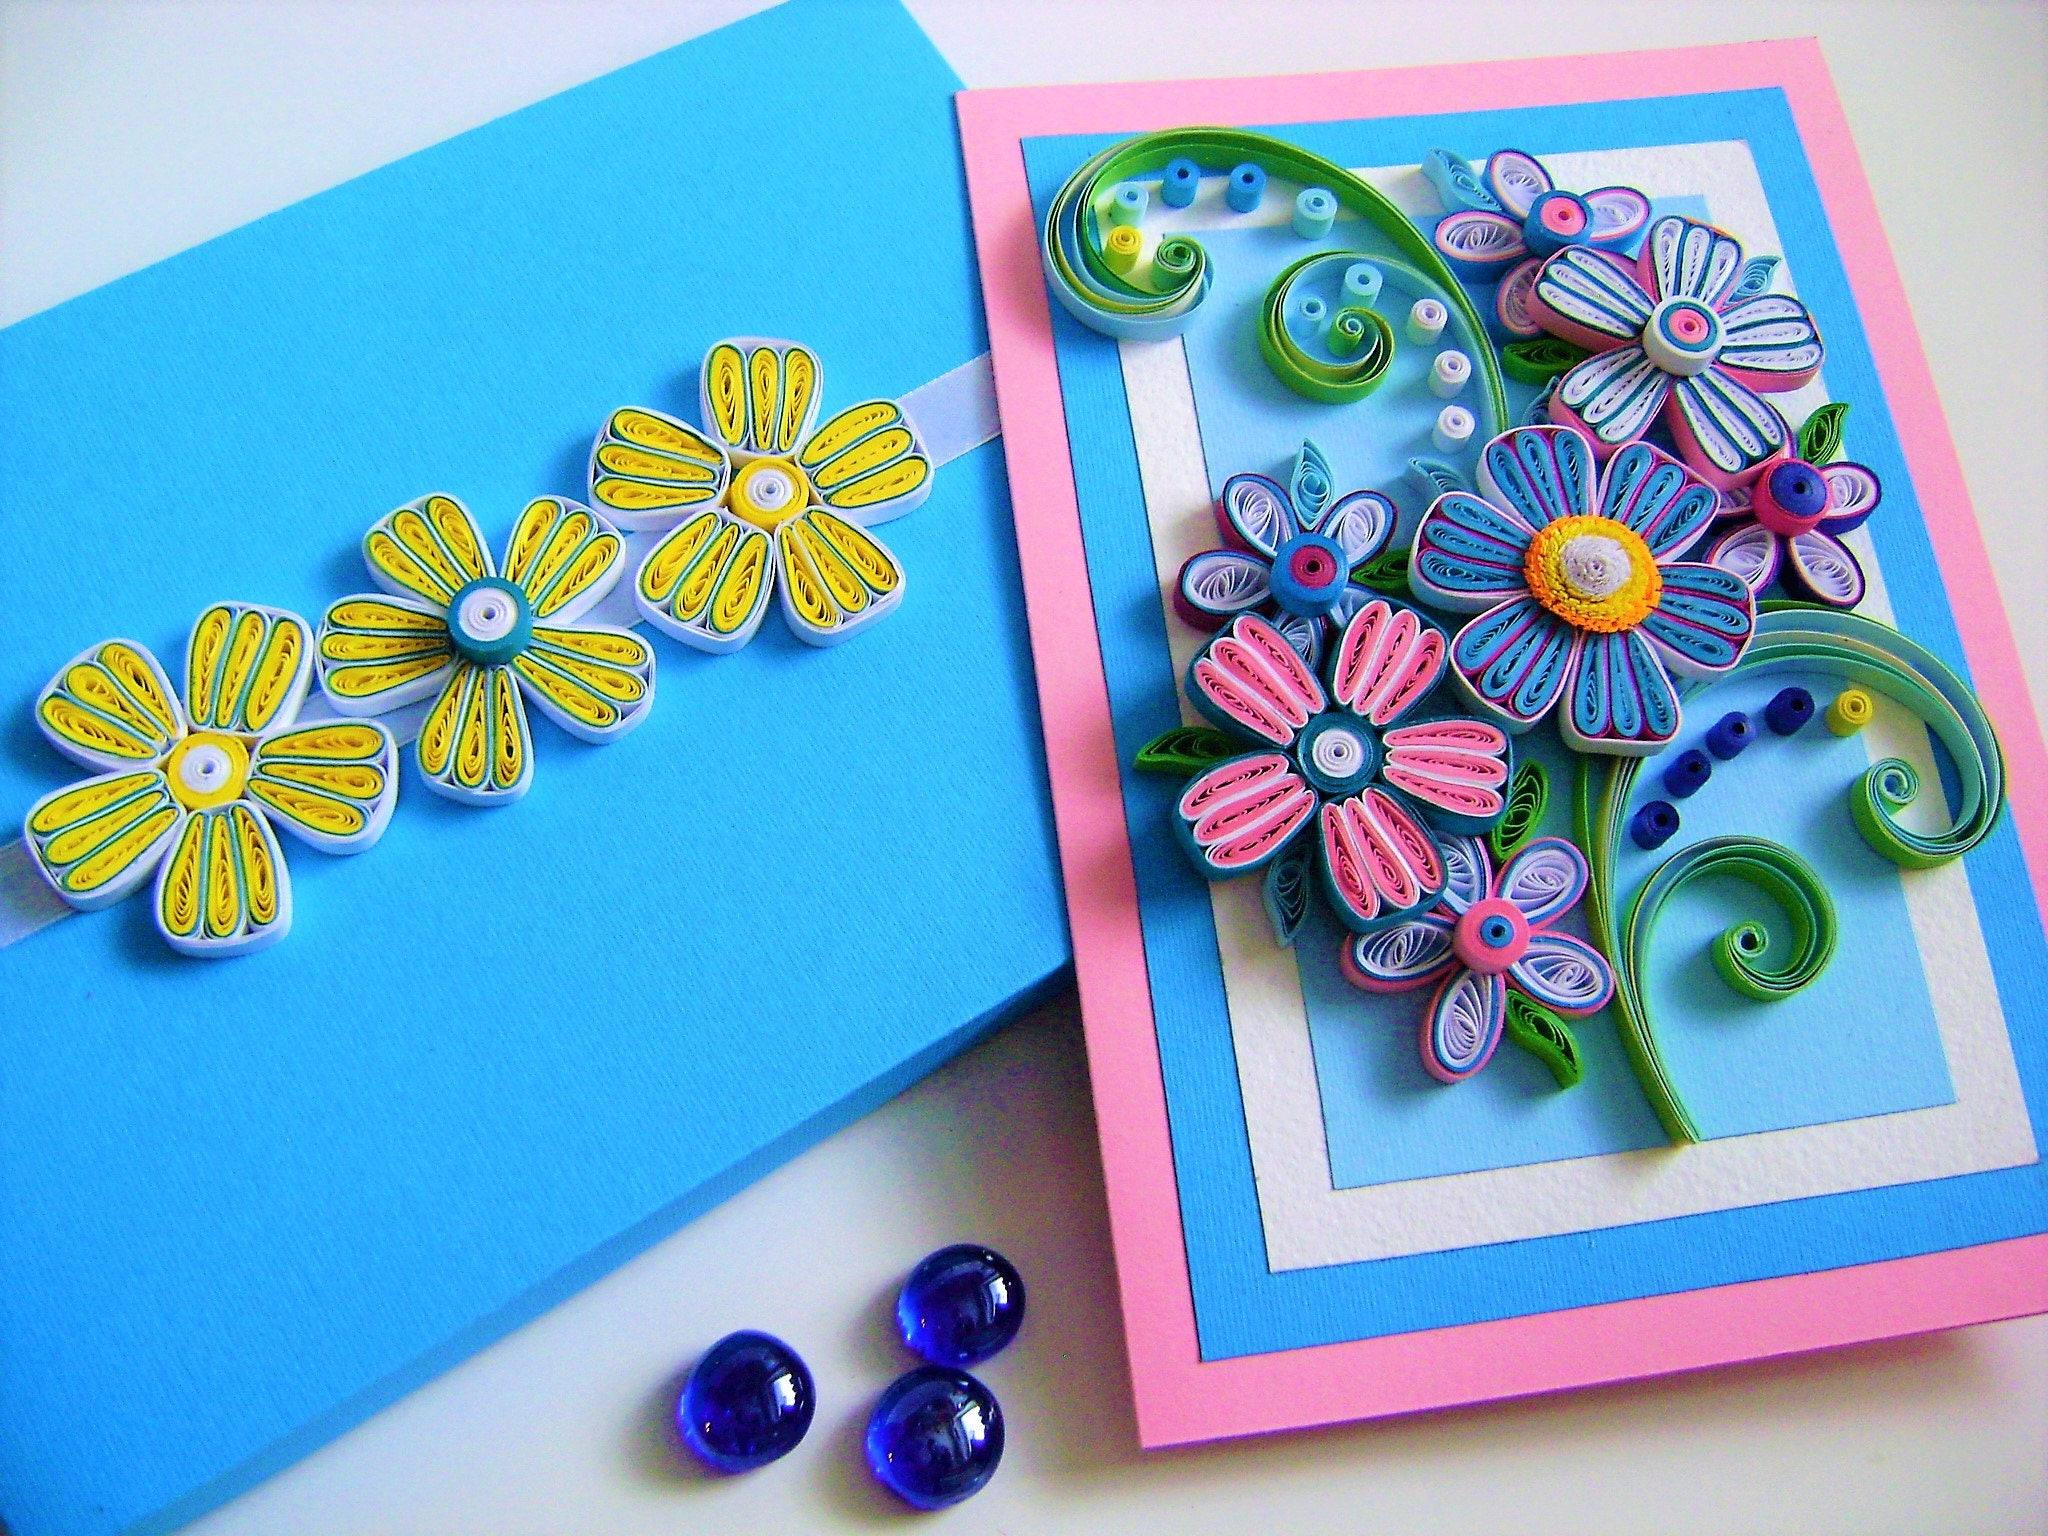 Anniversary Quilling Cardwedding Anniversary Cardanniversary Card